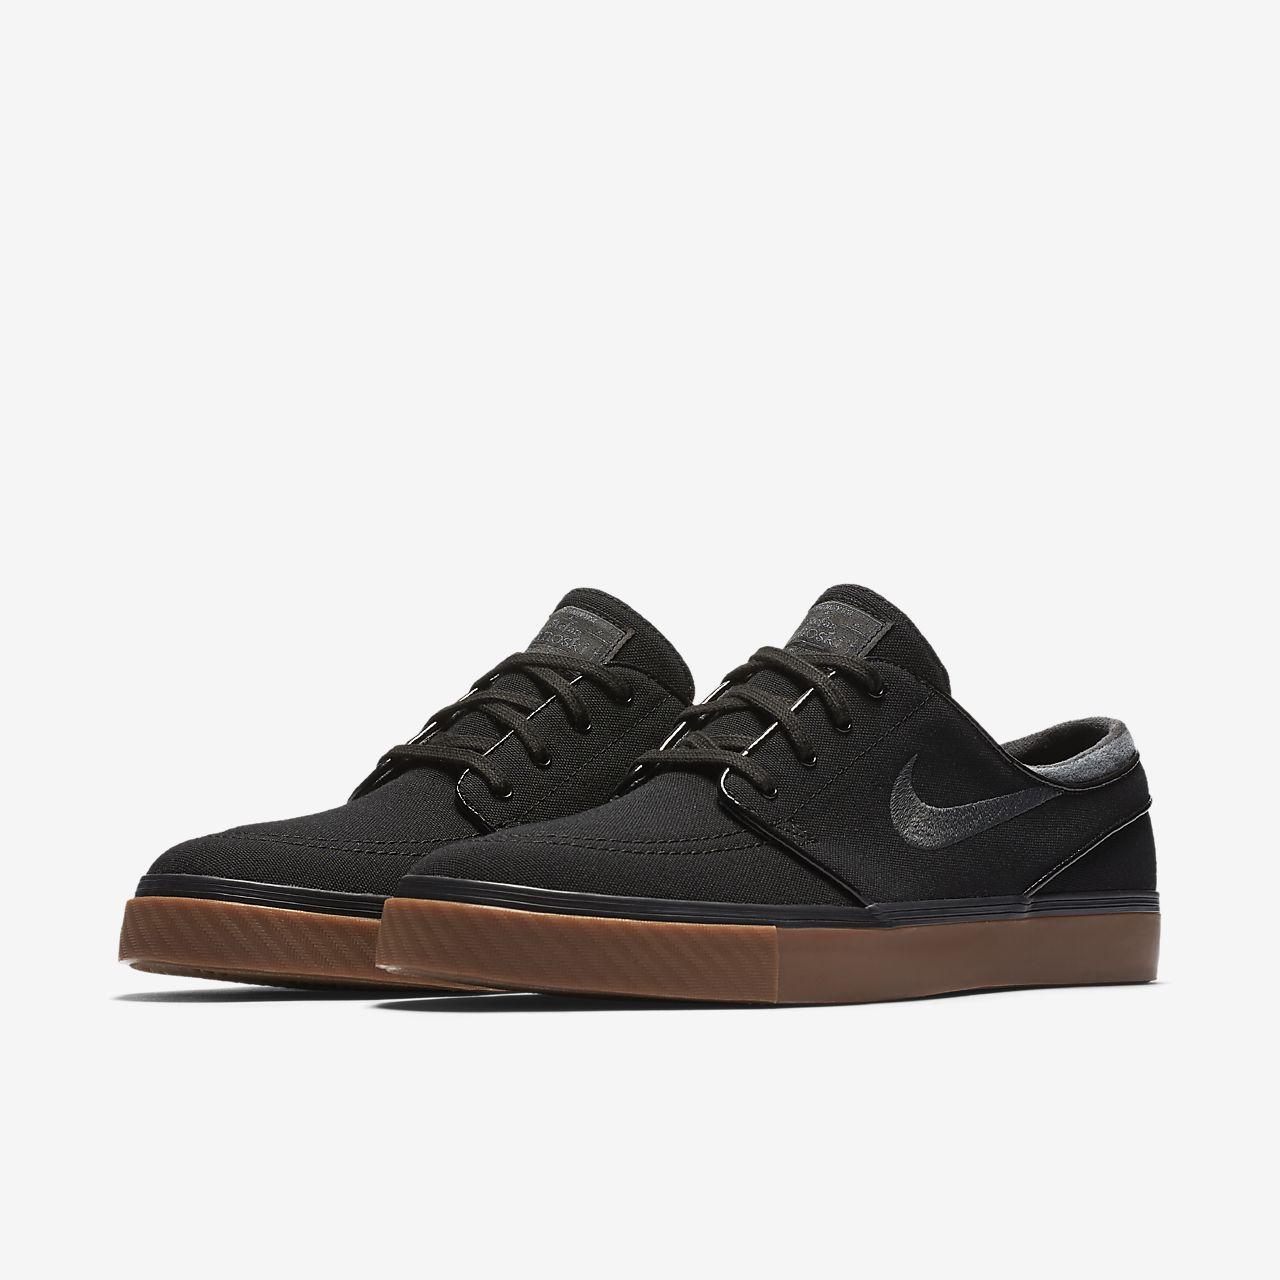 size 40 dbc70 0f9d0 nike zoom sb stefan janoski canvas kids shoe store